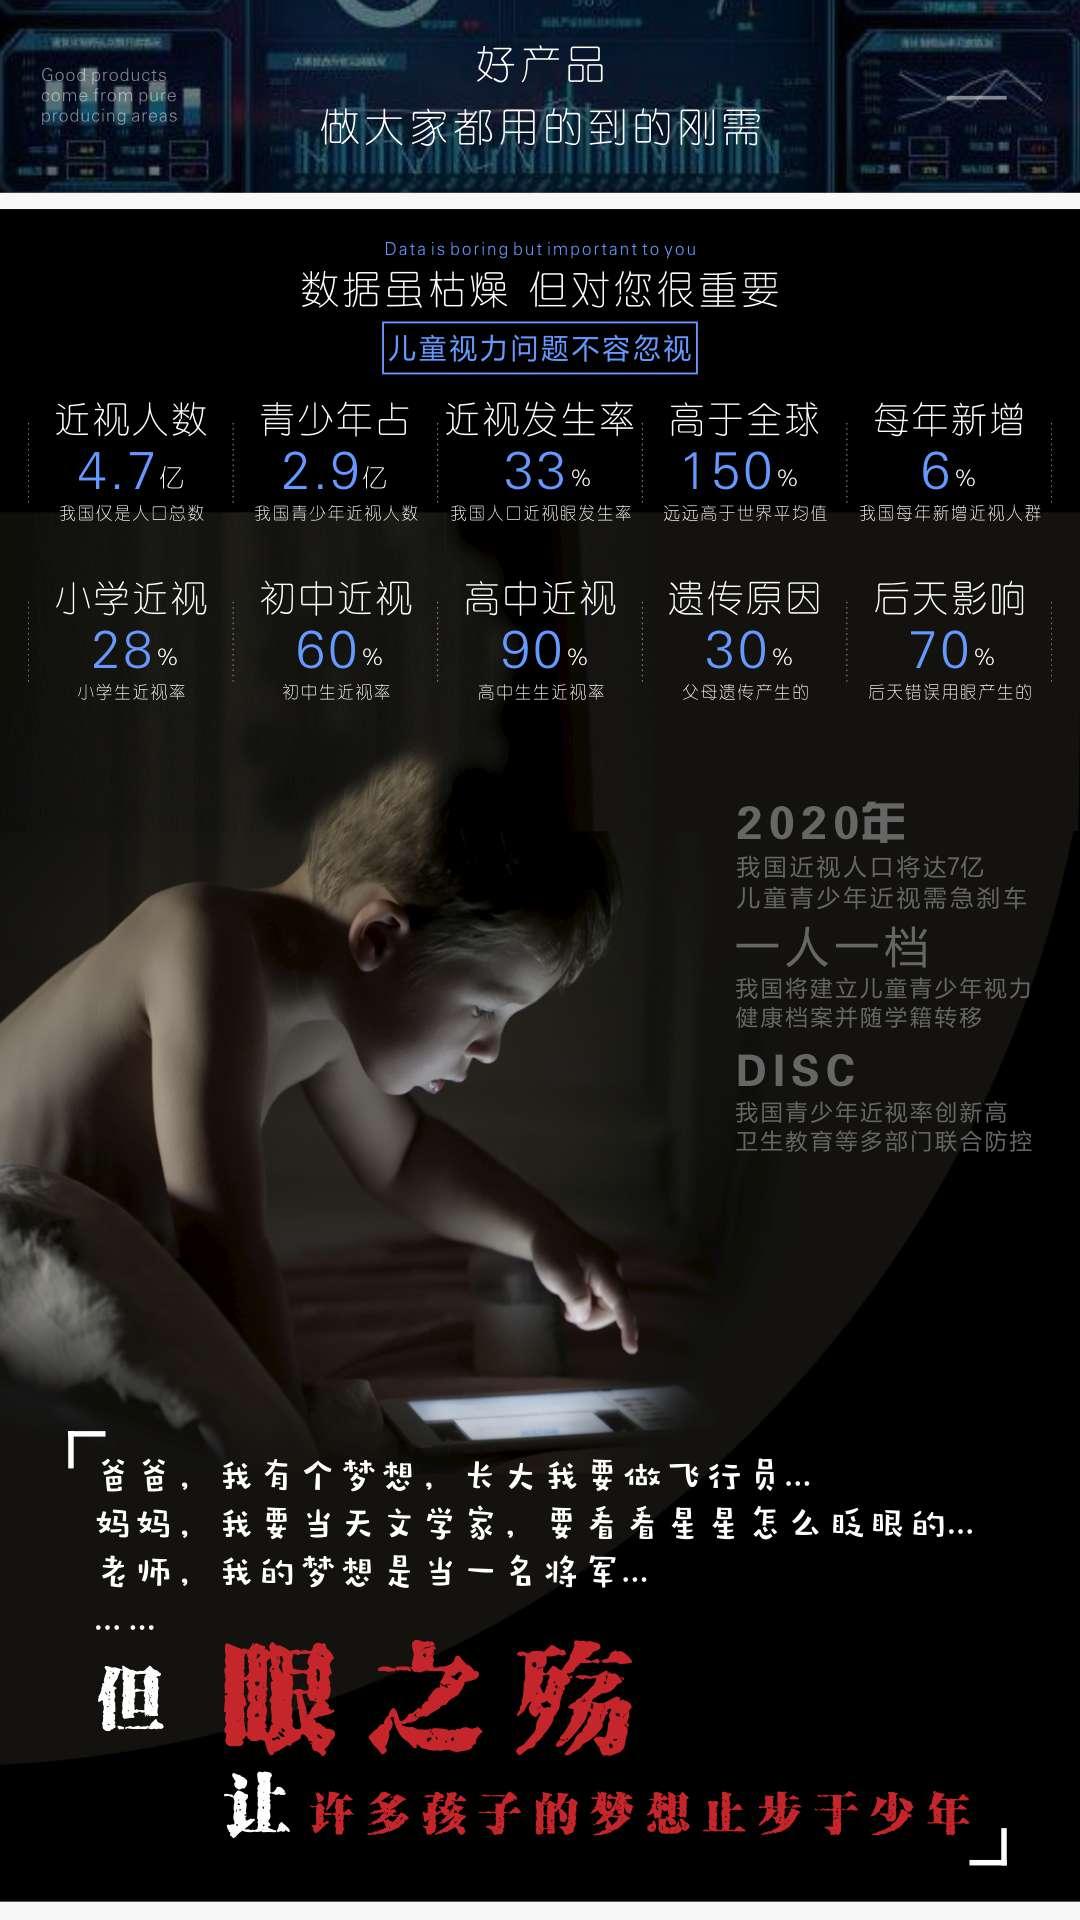 Z 至臻尚品-臻明眸藍莓花青素片-08.jpg